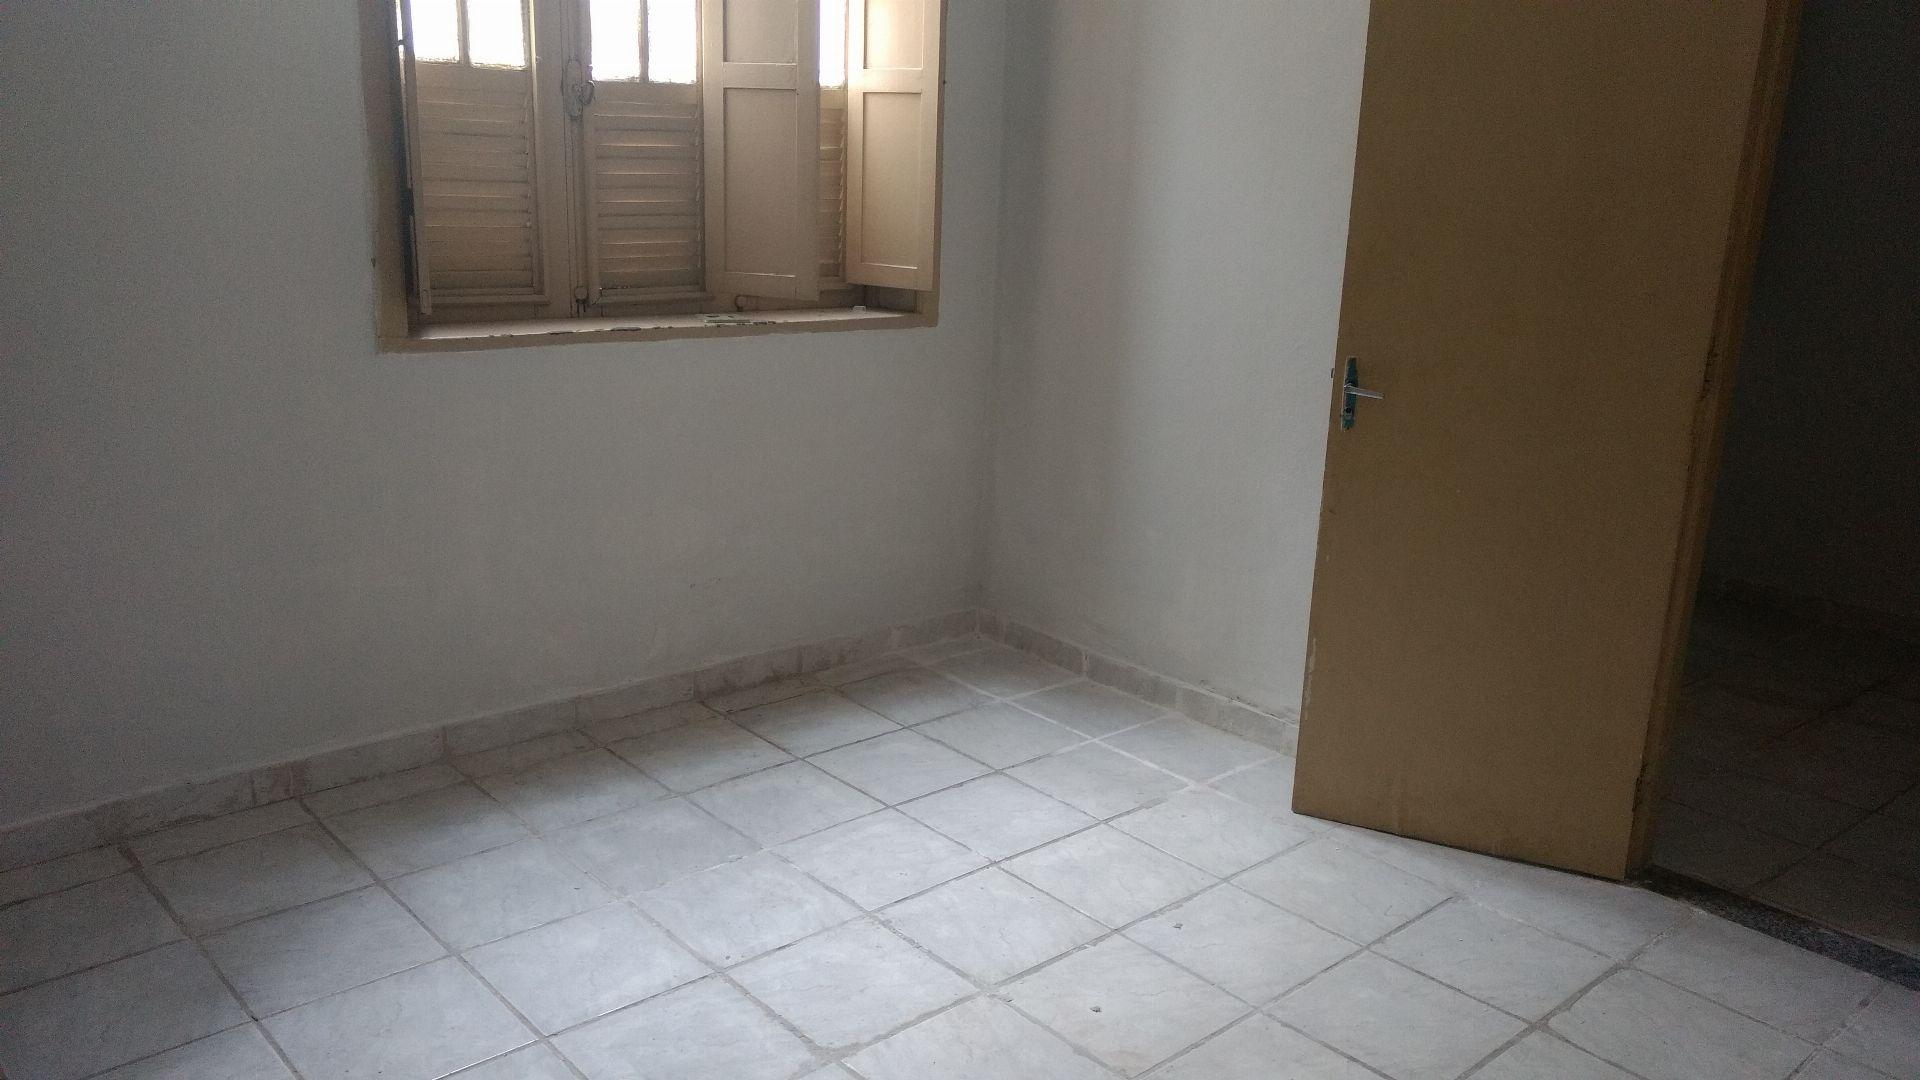 Casa para venda, Ramos, Rio de Janeiro, RJ - 545102 - 8